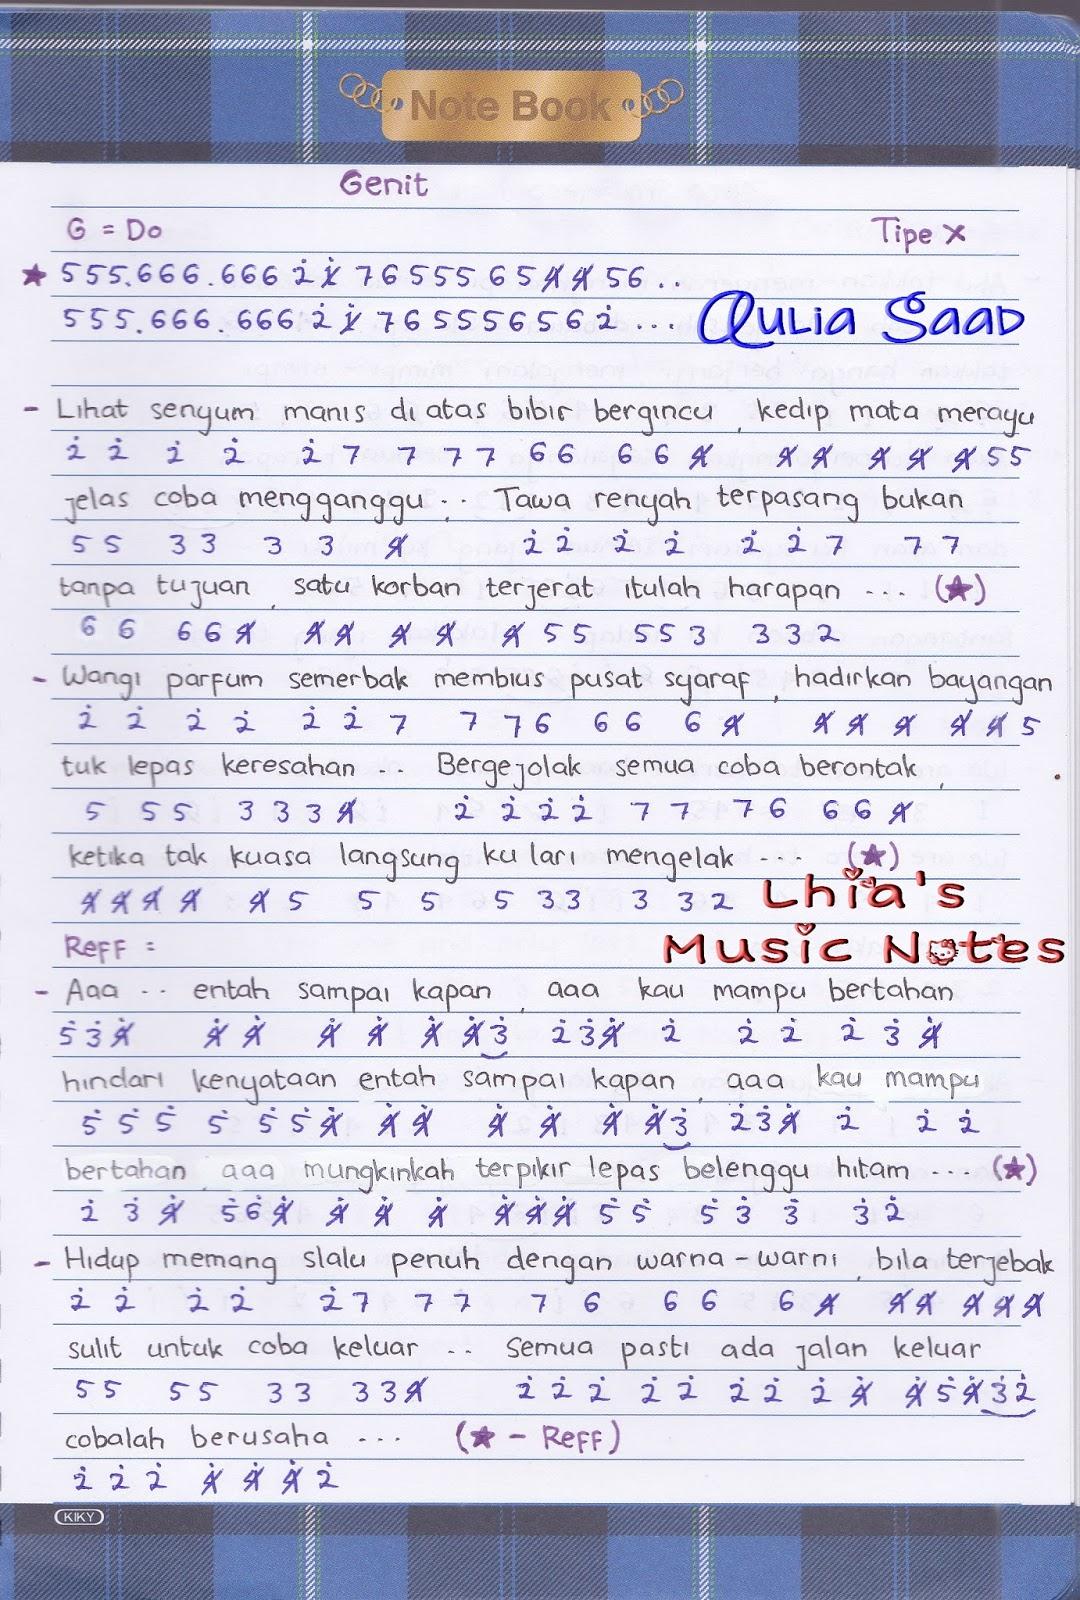 Chord : Tipe X - BOYBAND